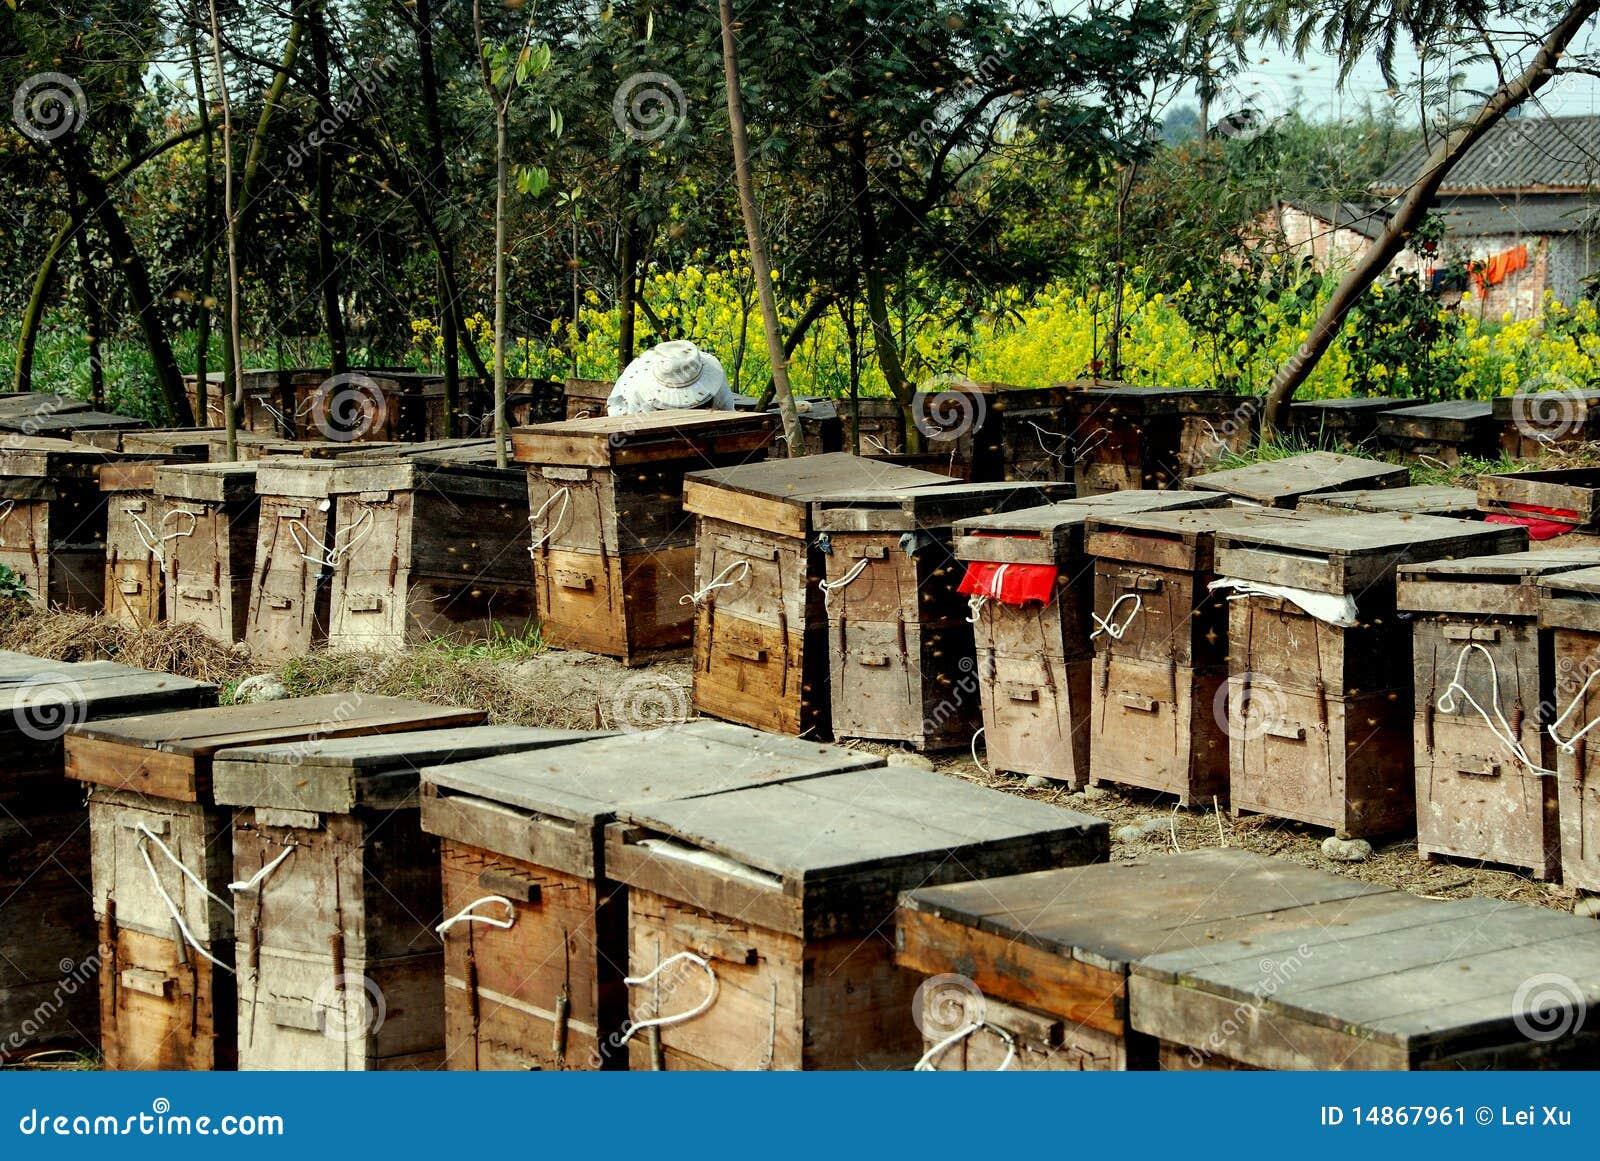 Pengzhou China Bee Hive Boxes